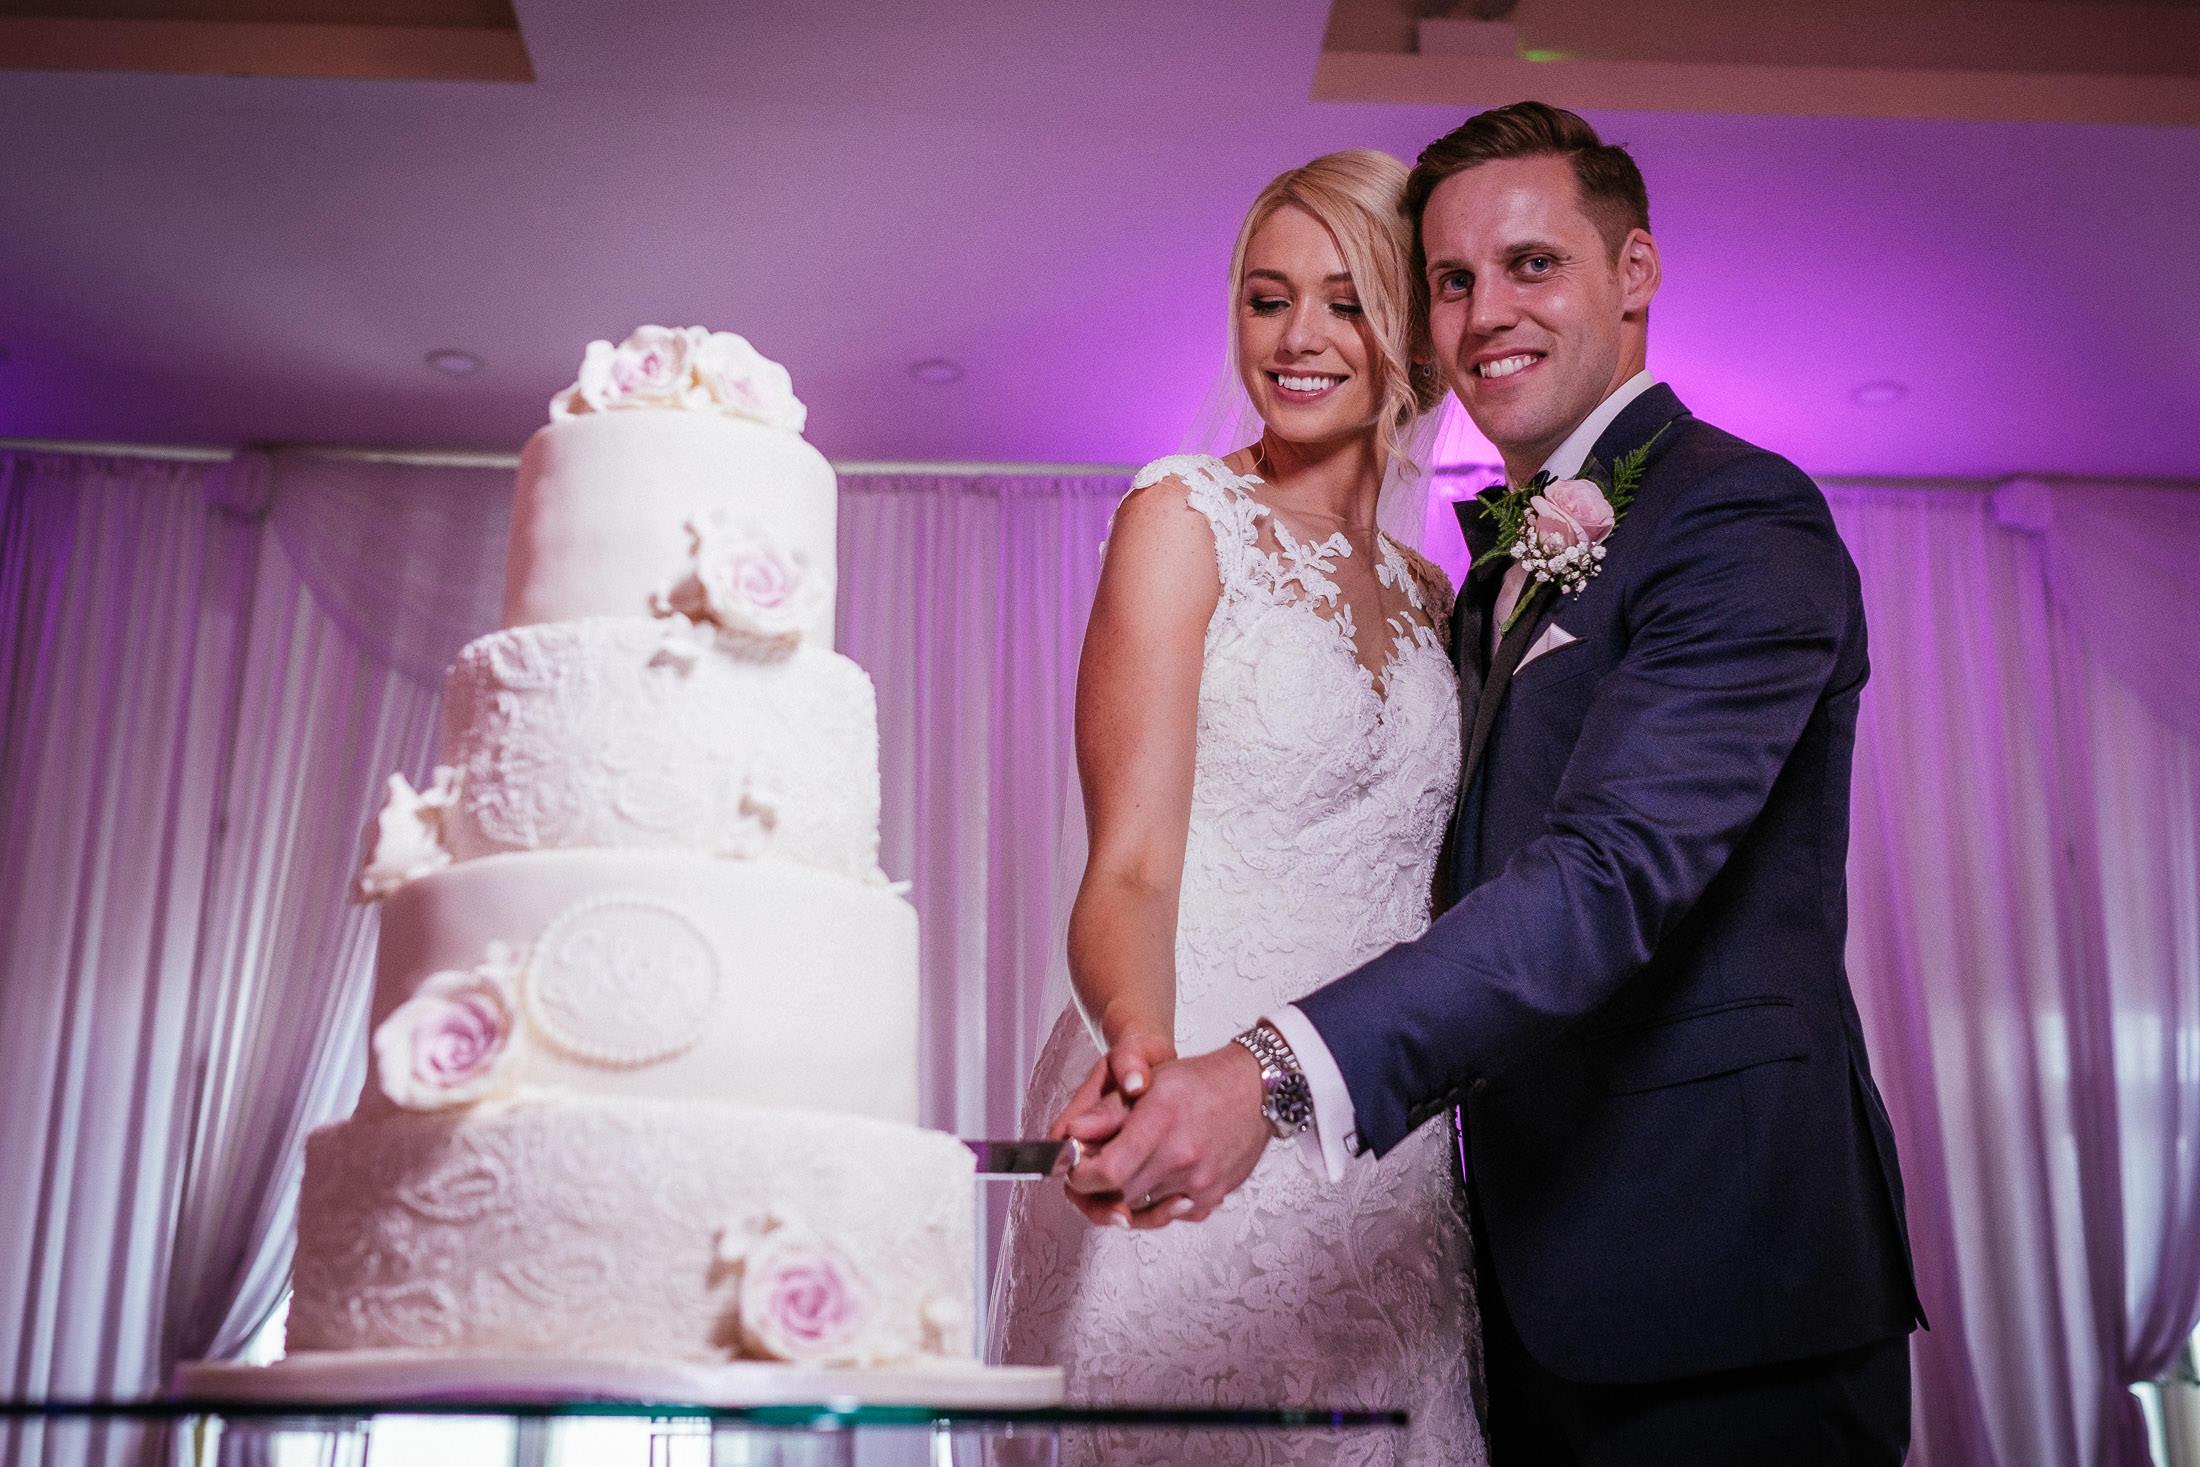 Knightsbrook Hotel Trim Castle Wedding Photographer 85